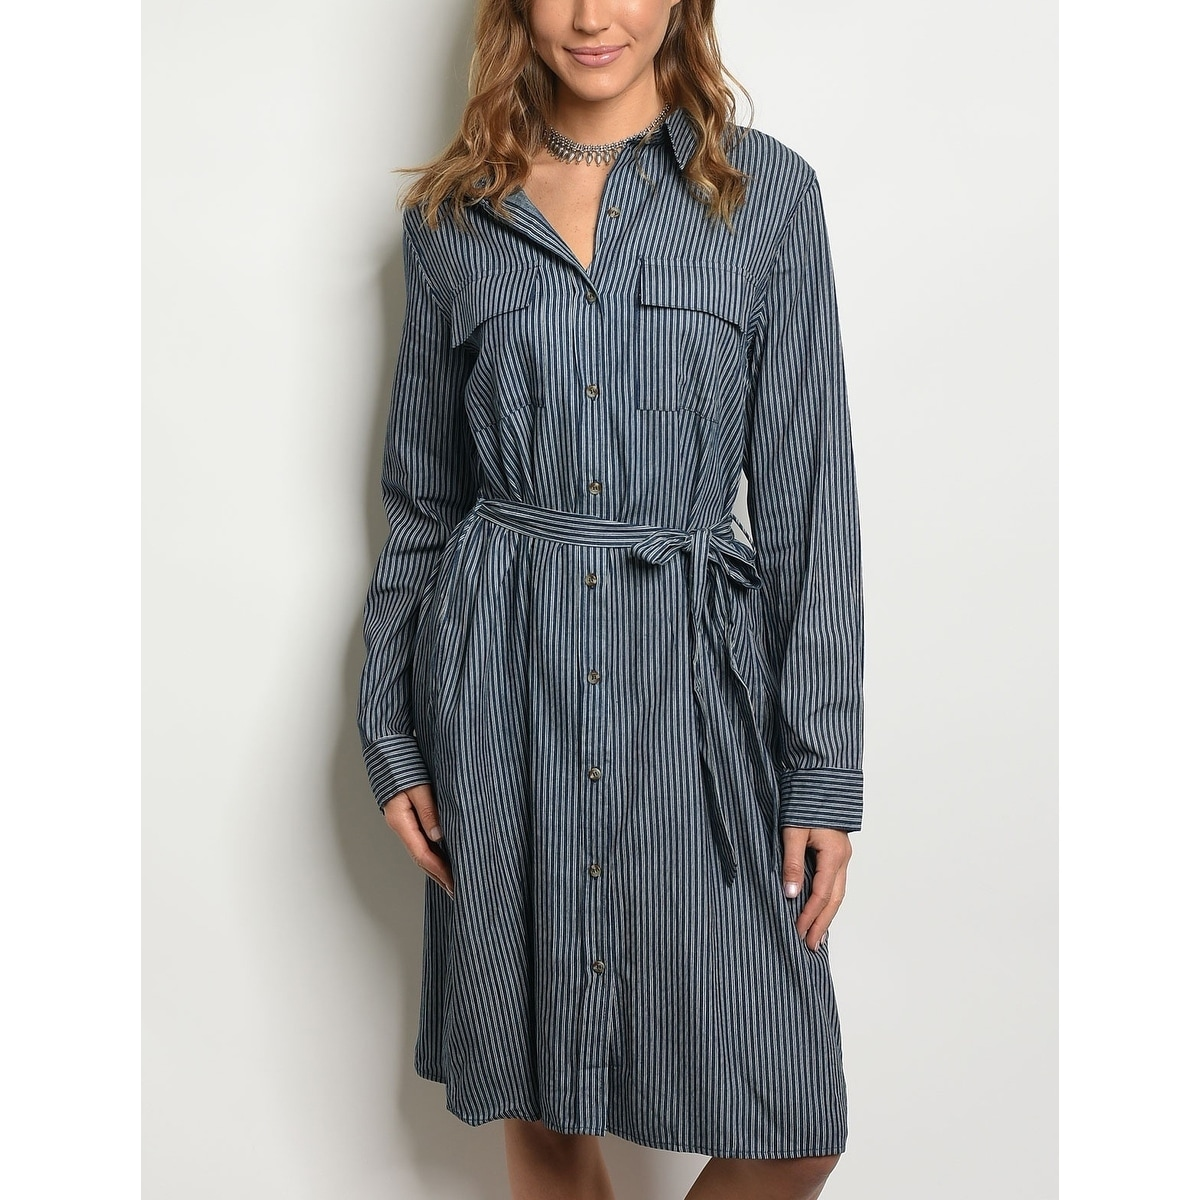 c0ed40e7 Long Denim Button Down Shirt Dress